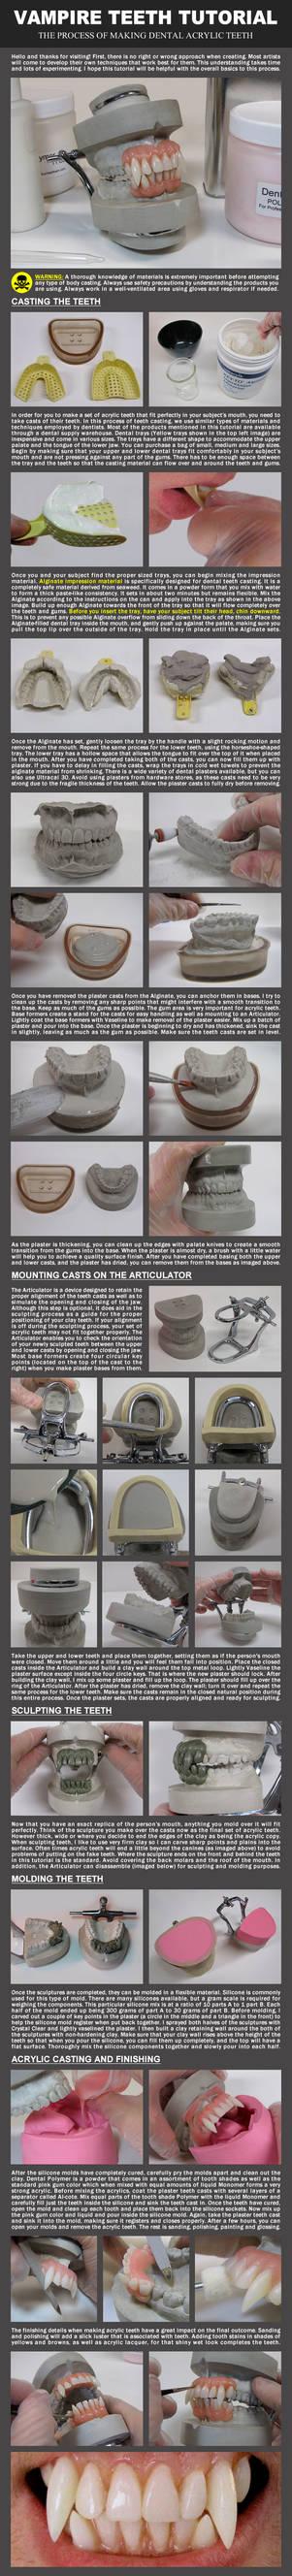 Vampire Teeth Tutorial